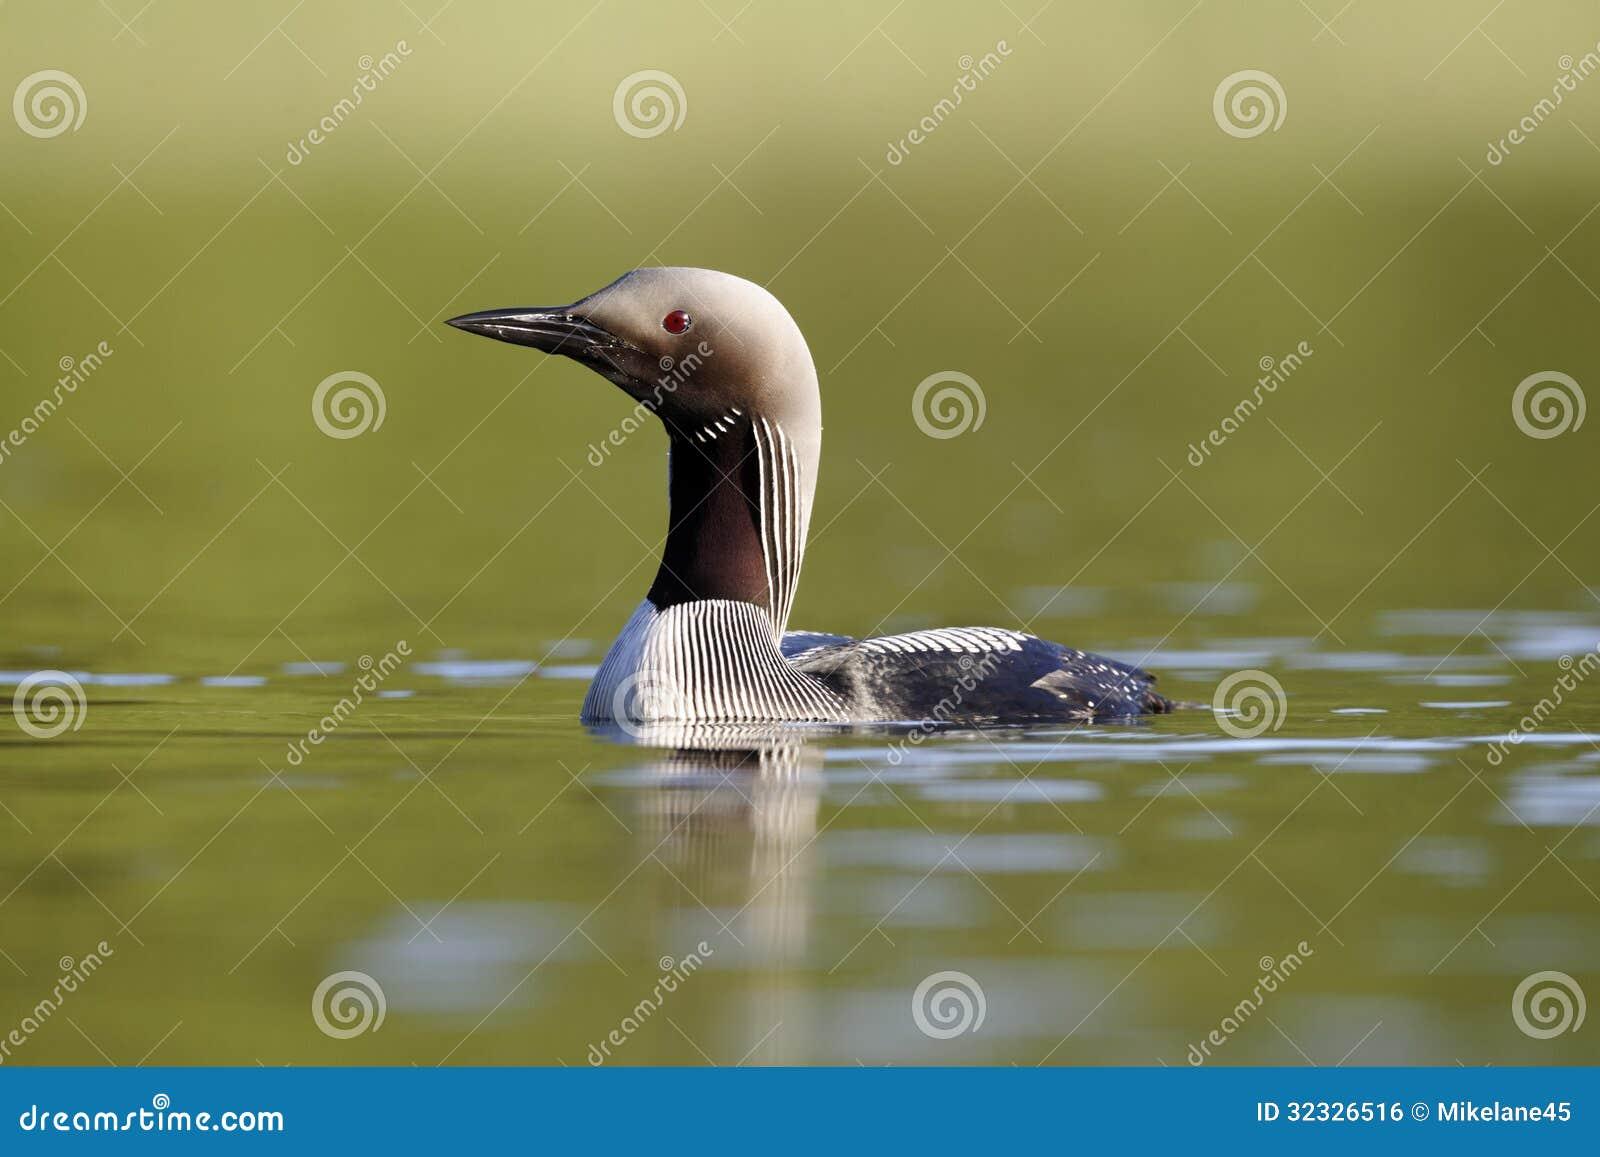 Black-throated diver, Gavia arctica